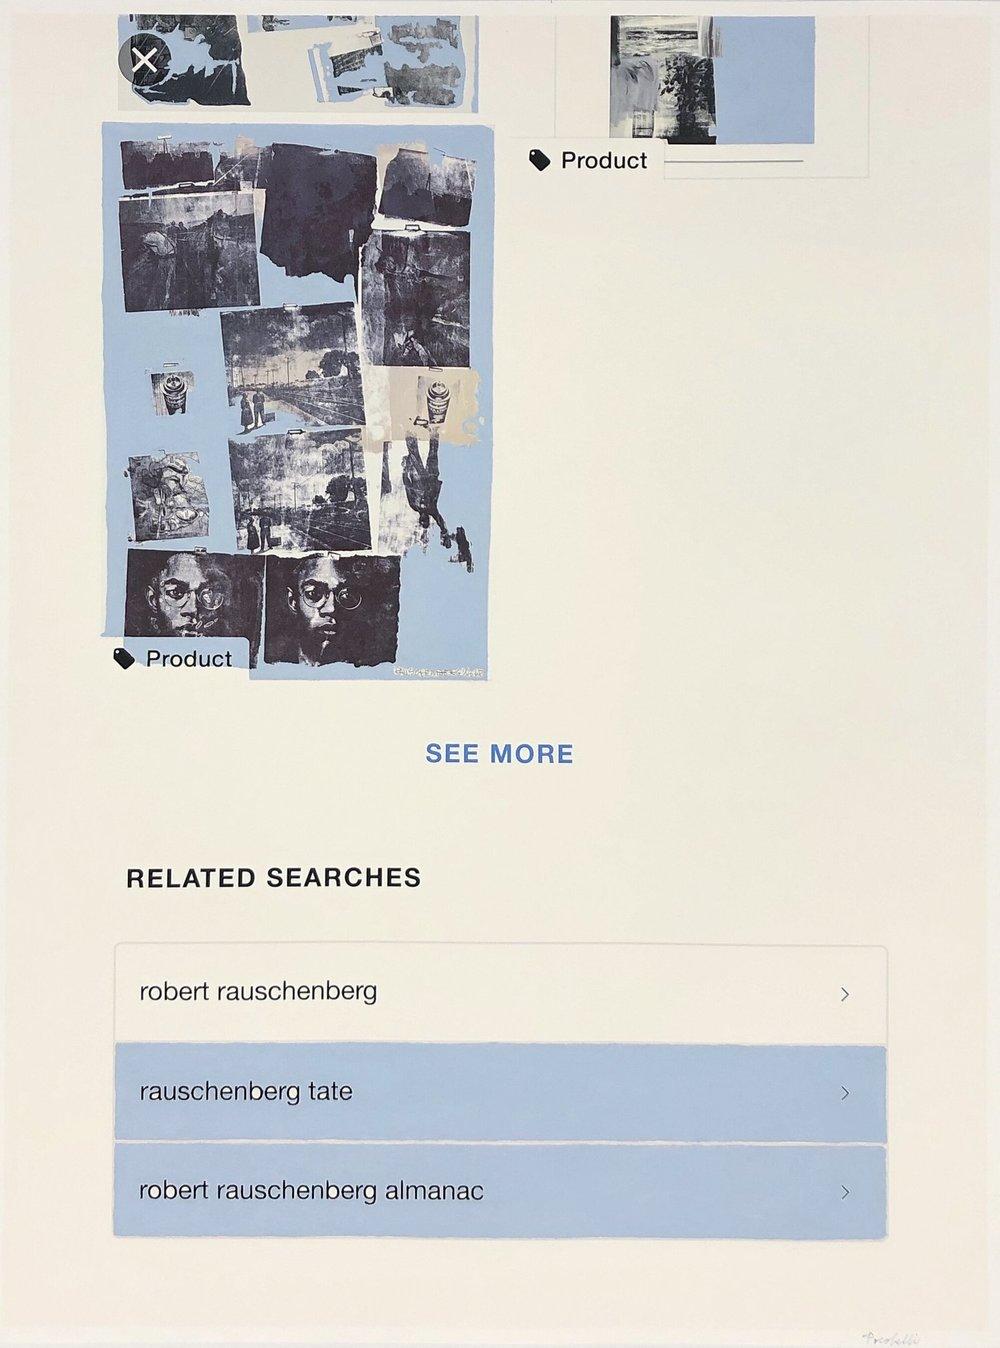 """q=rauschenberg+almanac"", 60 cm x 80 cm, inkjet and acrylic paint on hahnemuhle paper."